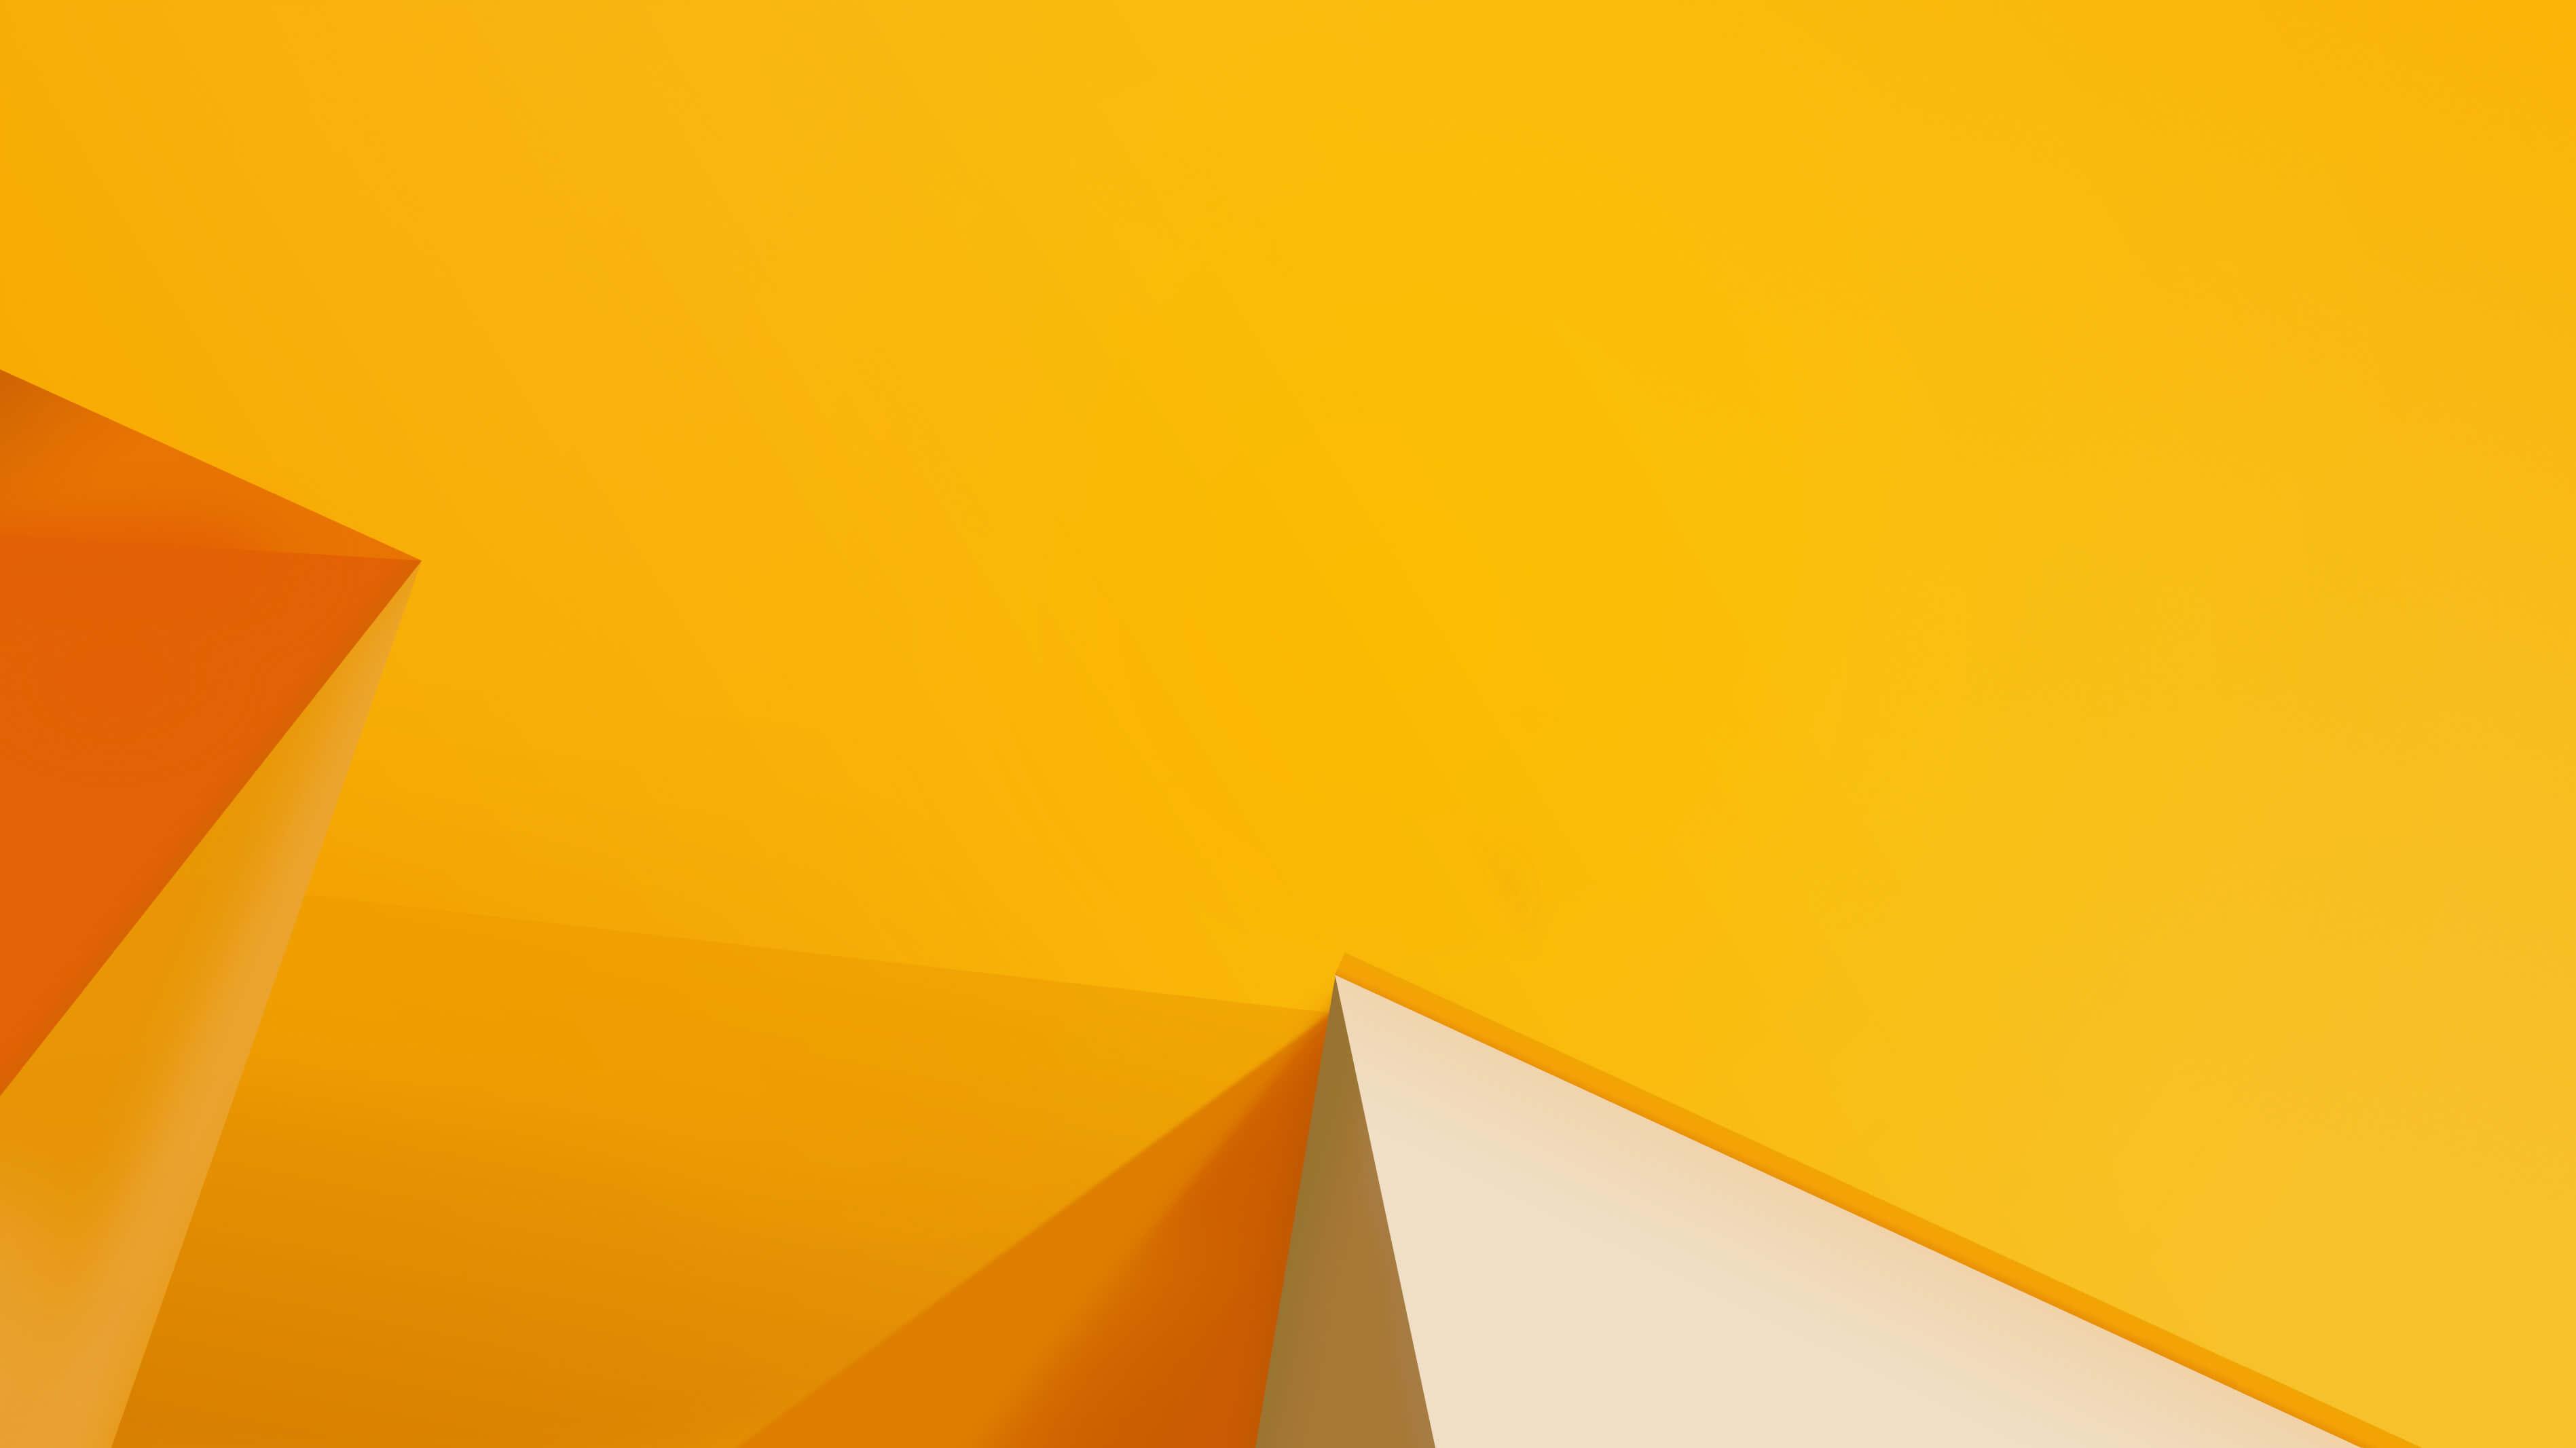 animated desktop wallpaper for windows 81